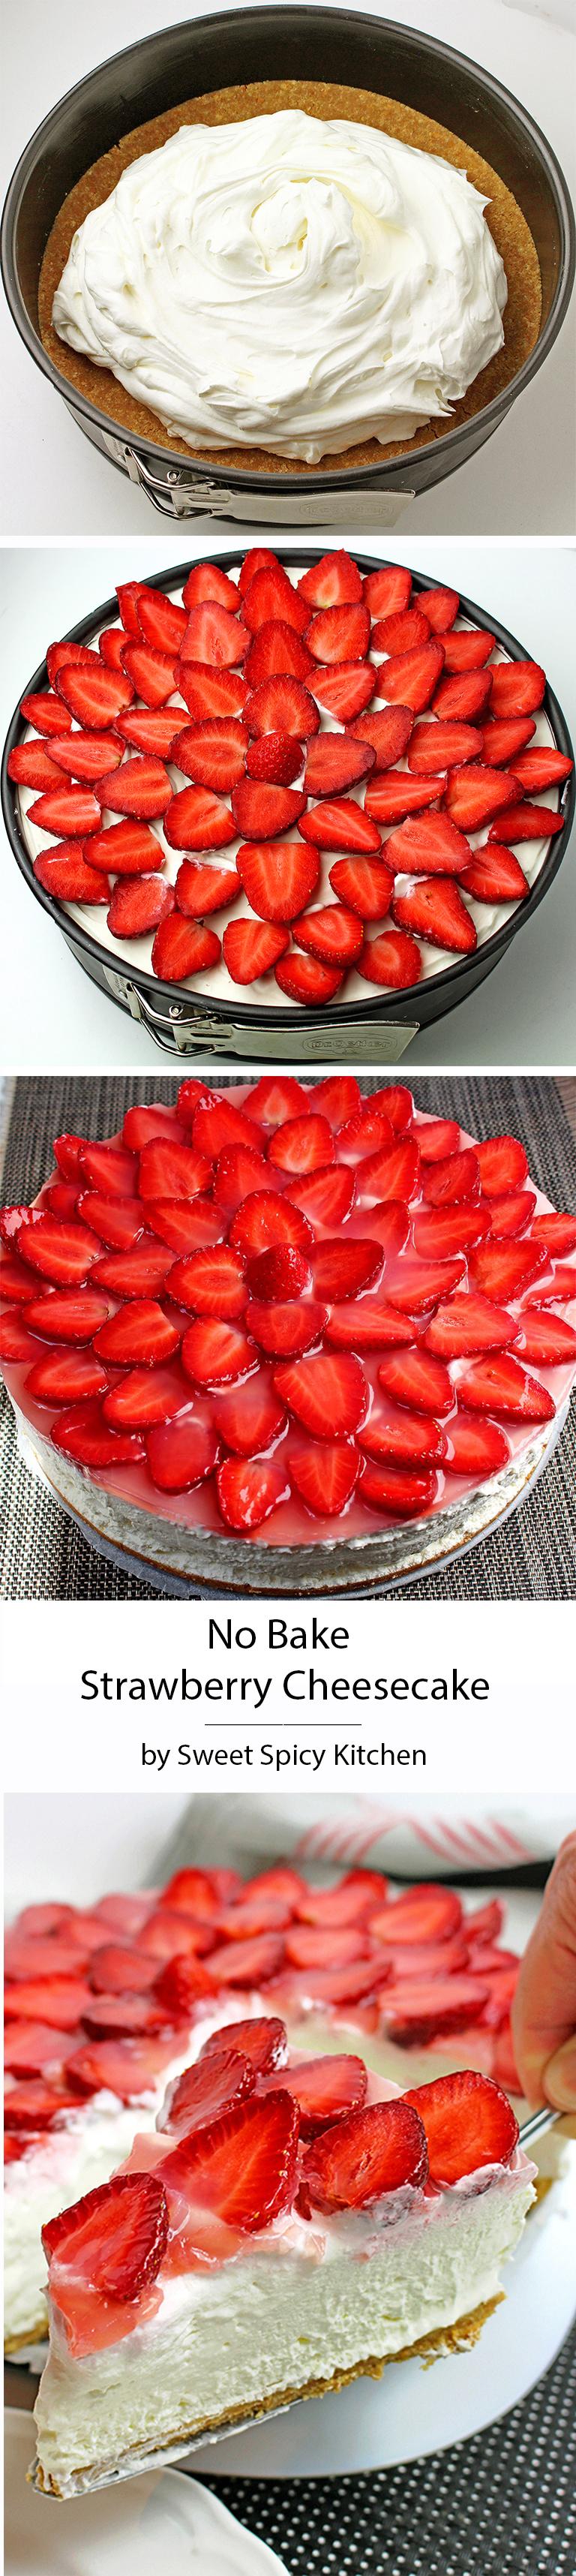 Untitled-10 No Bake Strawberry Cheesecake